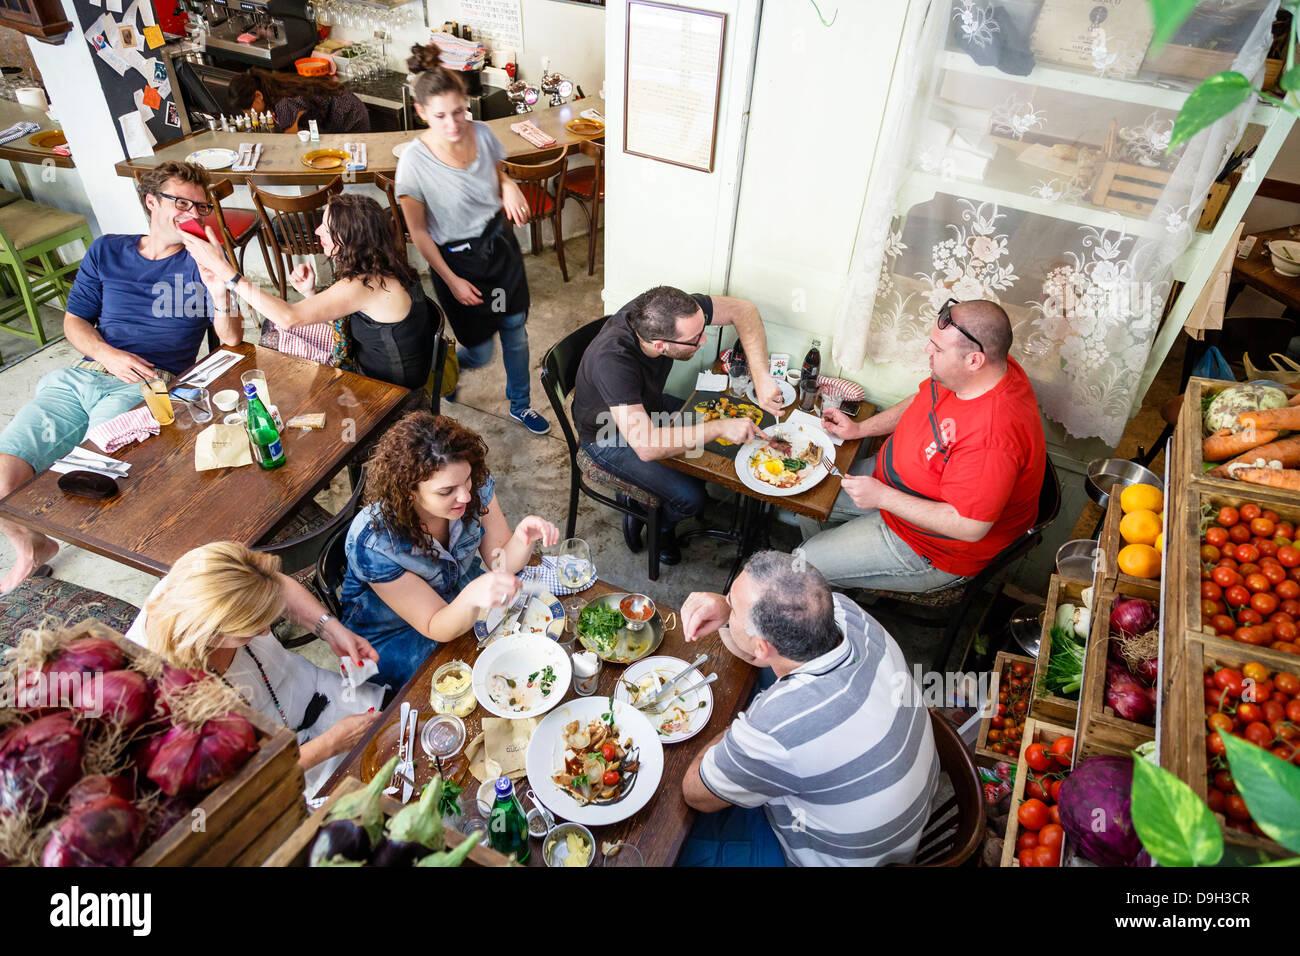 Ristorante Machneyuda, Gerusalemme, Israele. Immagini Stock